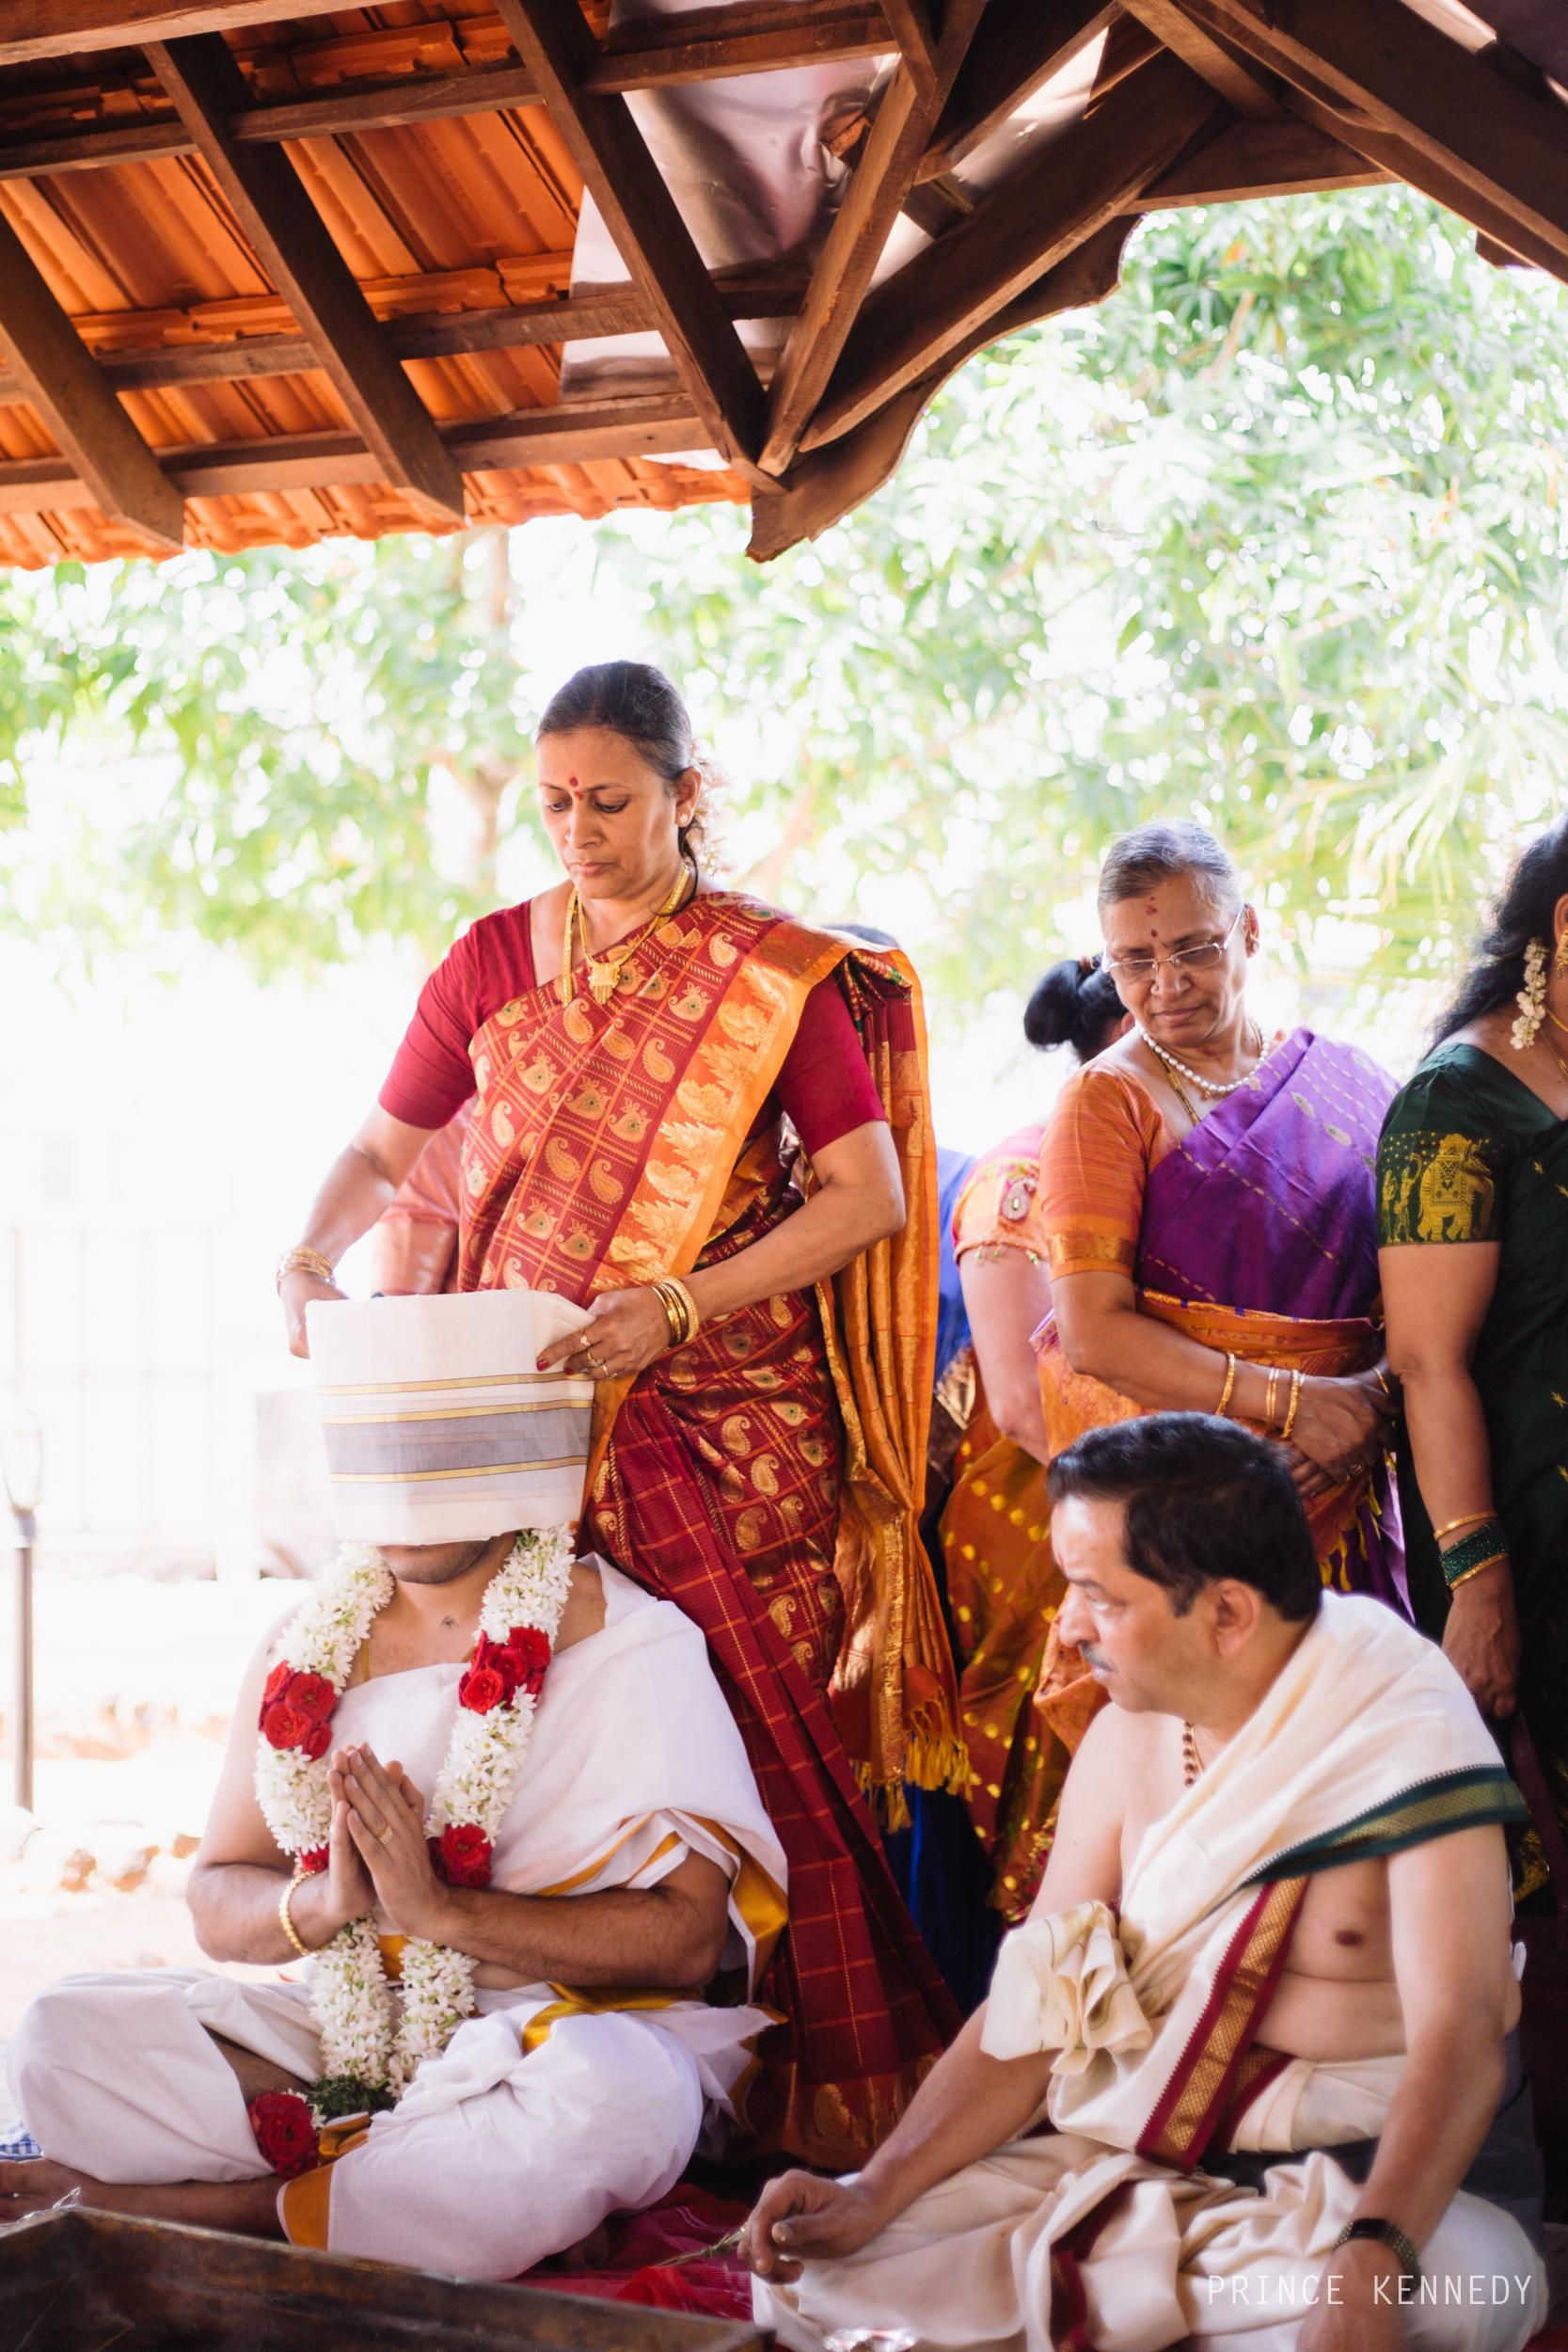 Athmajja-Nithesh-Engagement-Couple-Portrait-Portraiture-Wedding-Couple-Portrait-Chennai-Photographer-Candid-Photography-Destination-Best-Prince-Kennedy-Photography-114.jpg